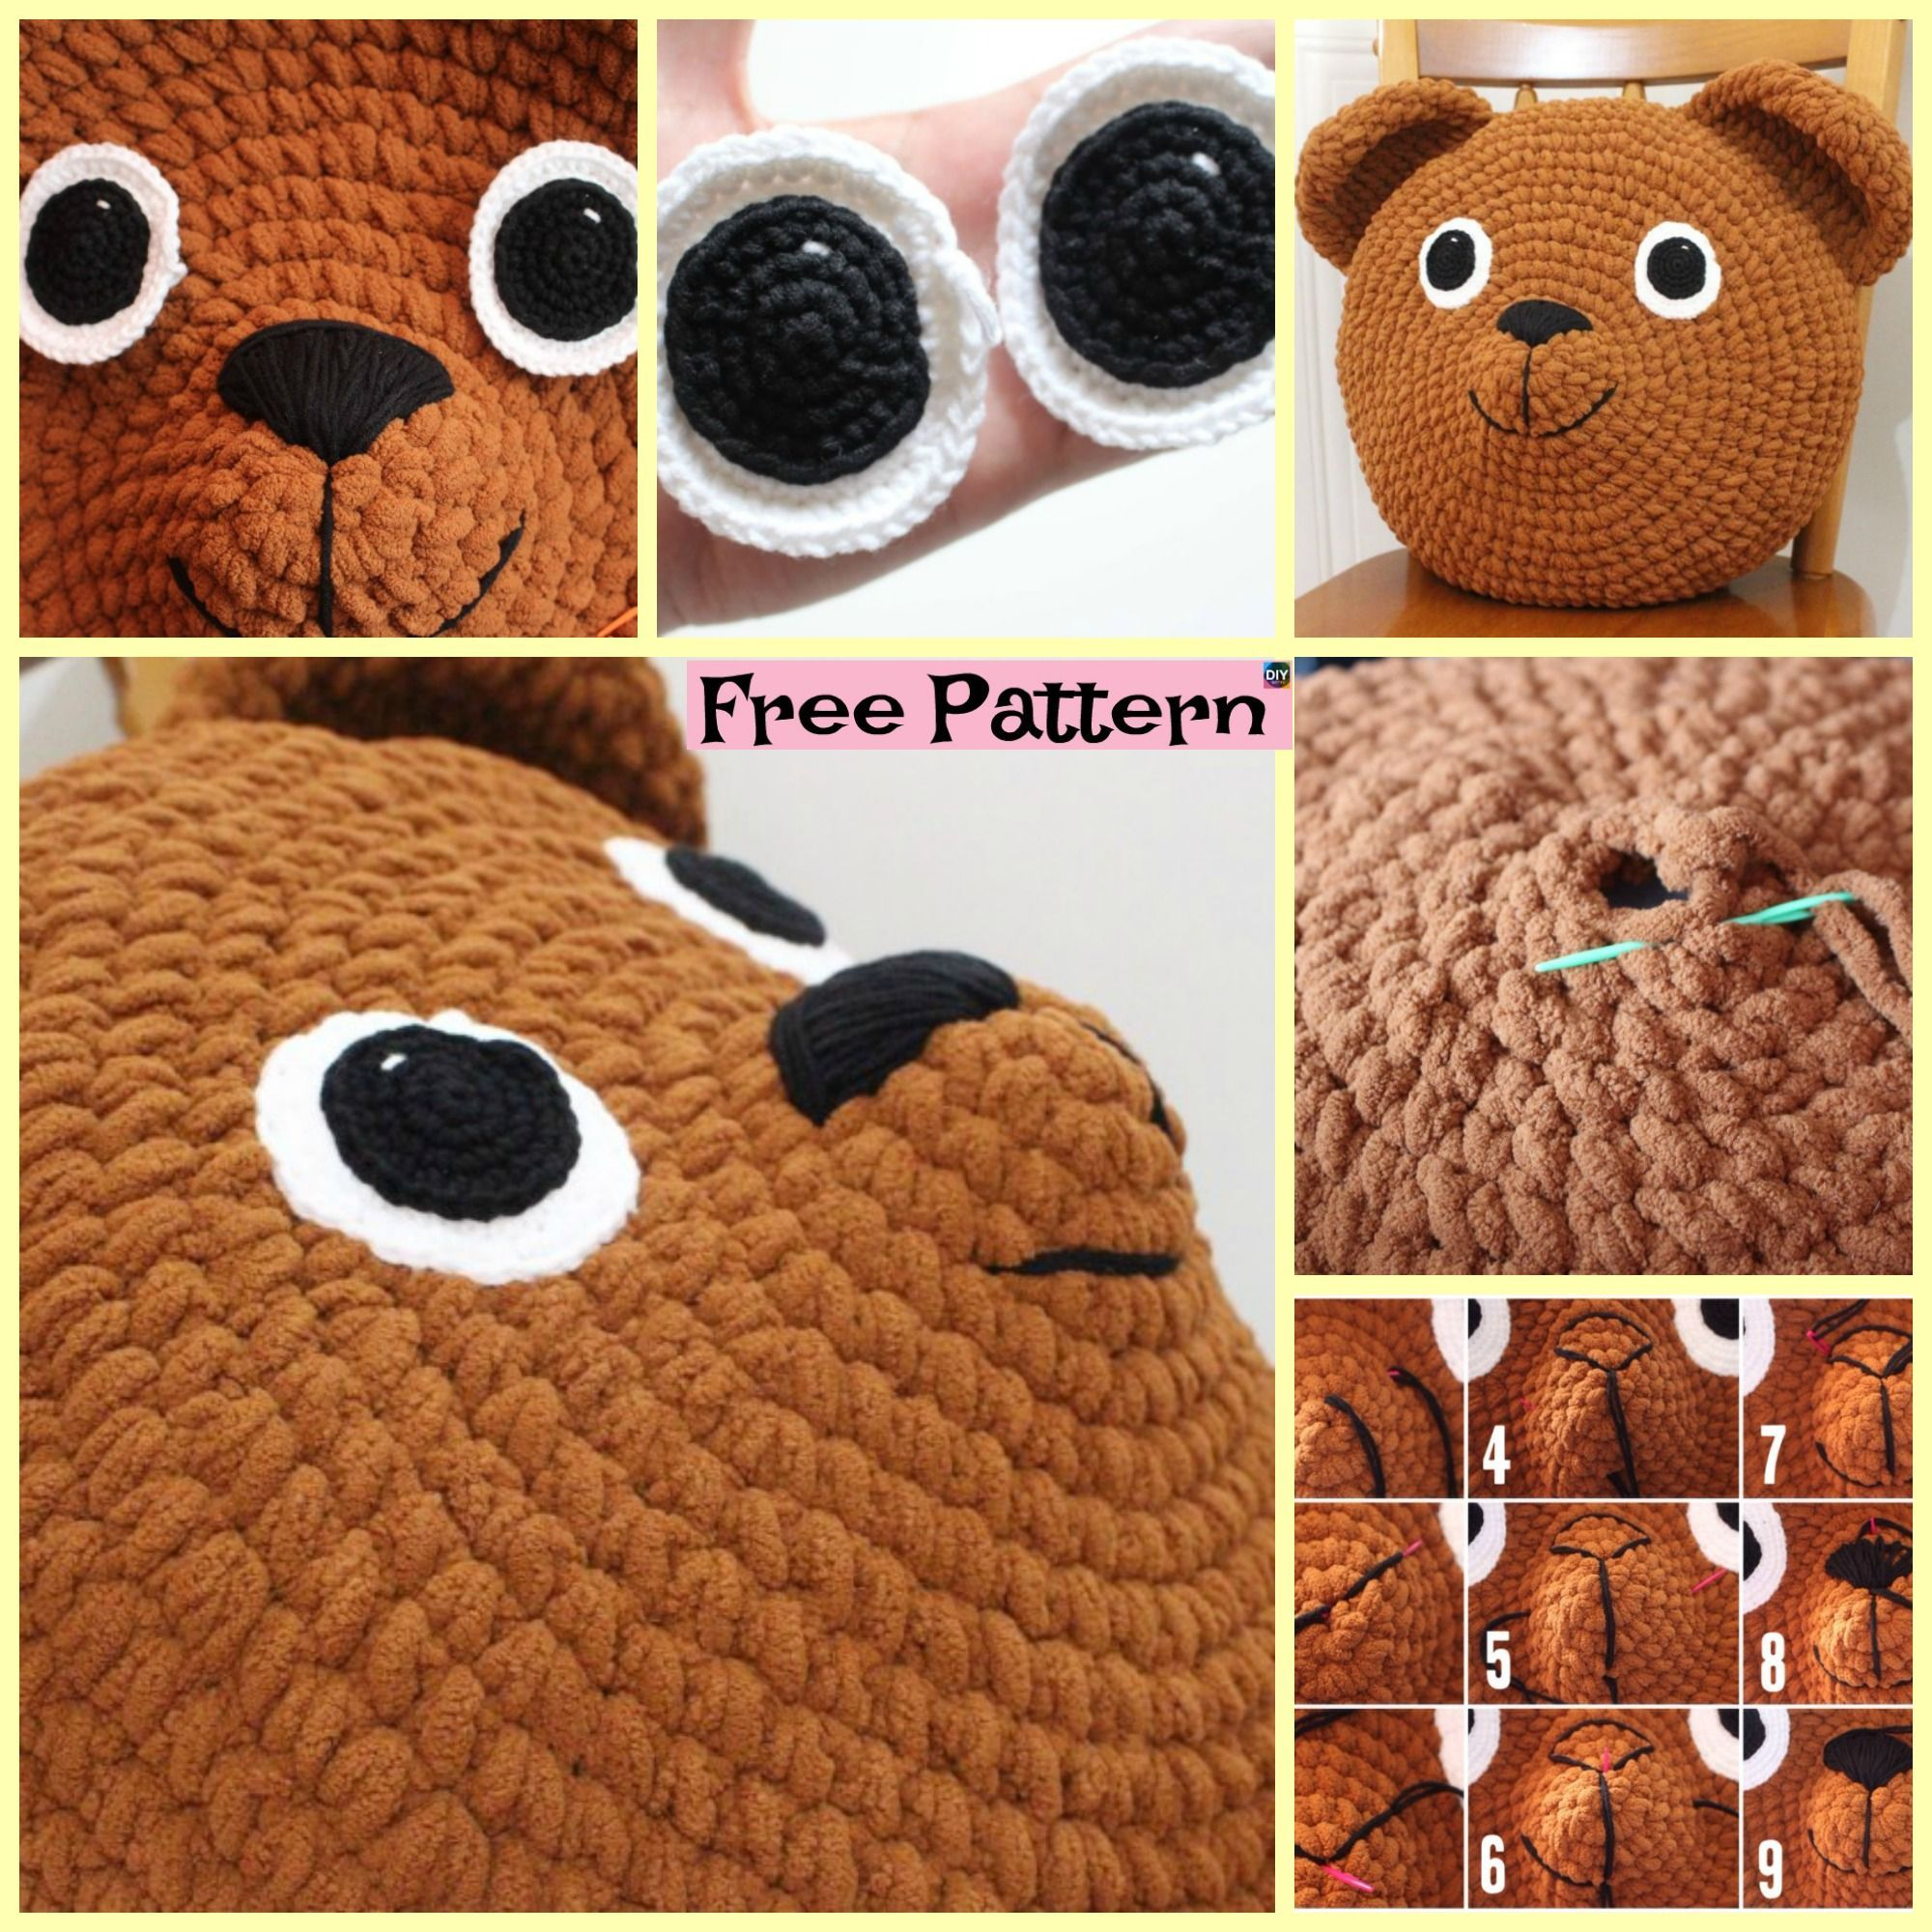 Teddy CROCHET PATTERN Teddy Bear Cushion Pillow Cover 4ply DMC for sale  online | 2000x2000